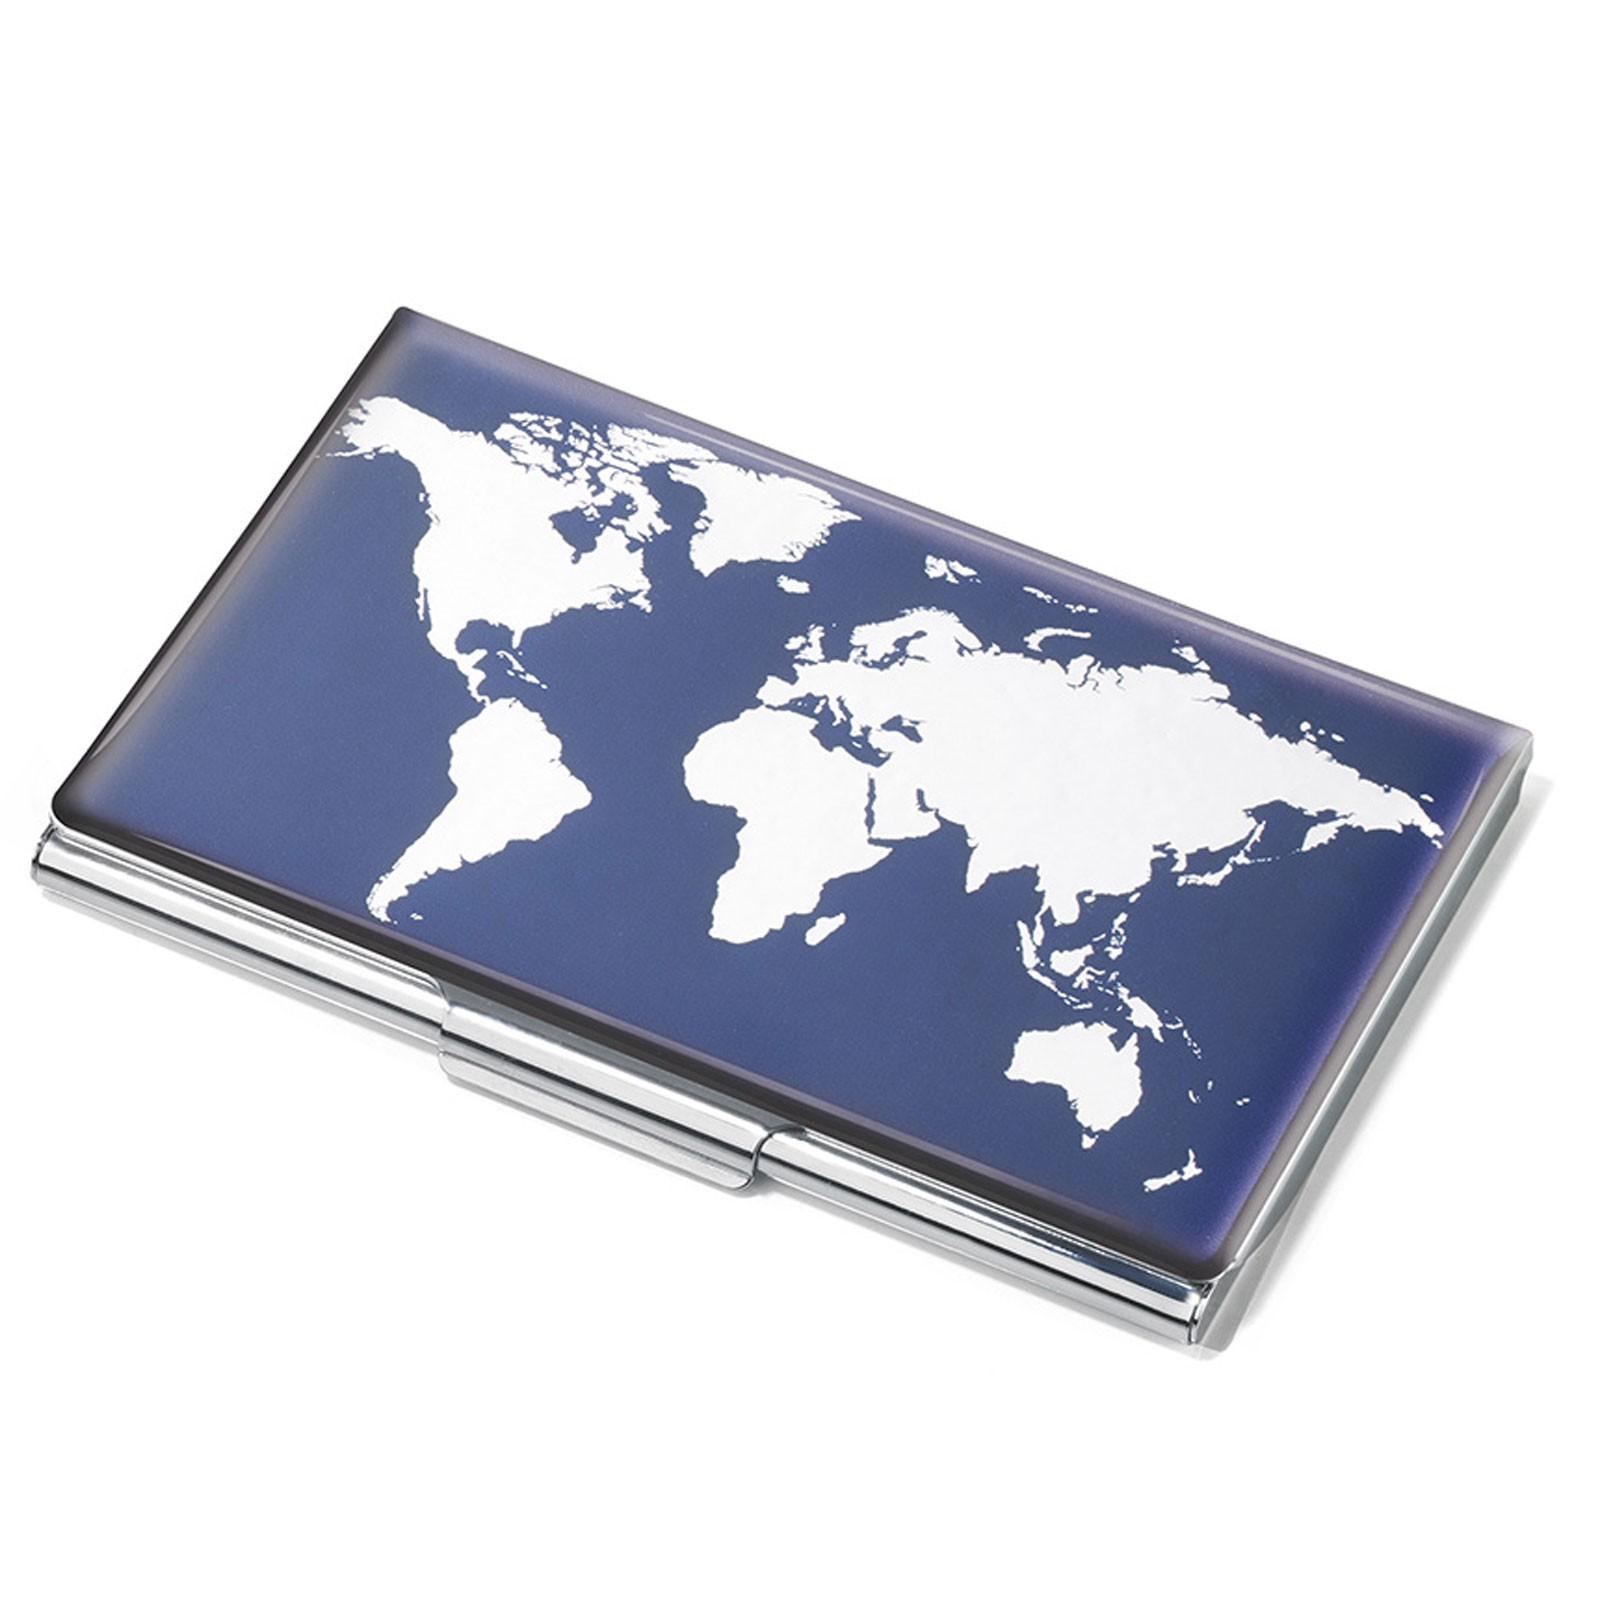 Troika Visitenkartenetui Flach Weltkarte Mit Dekor